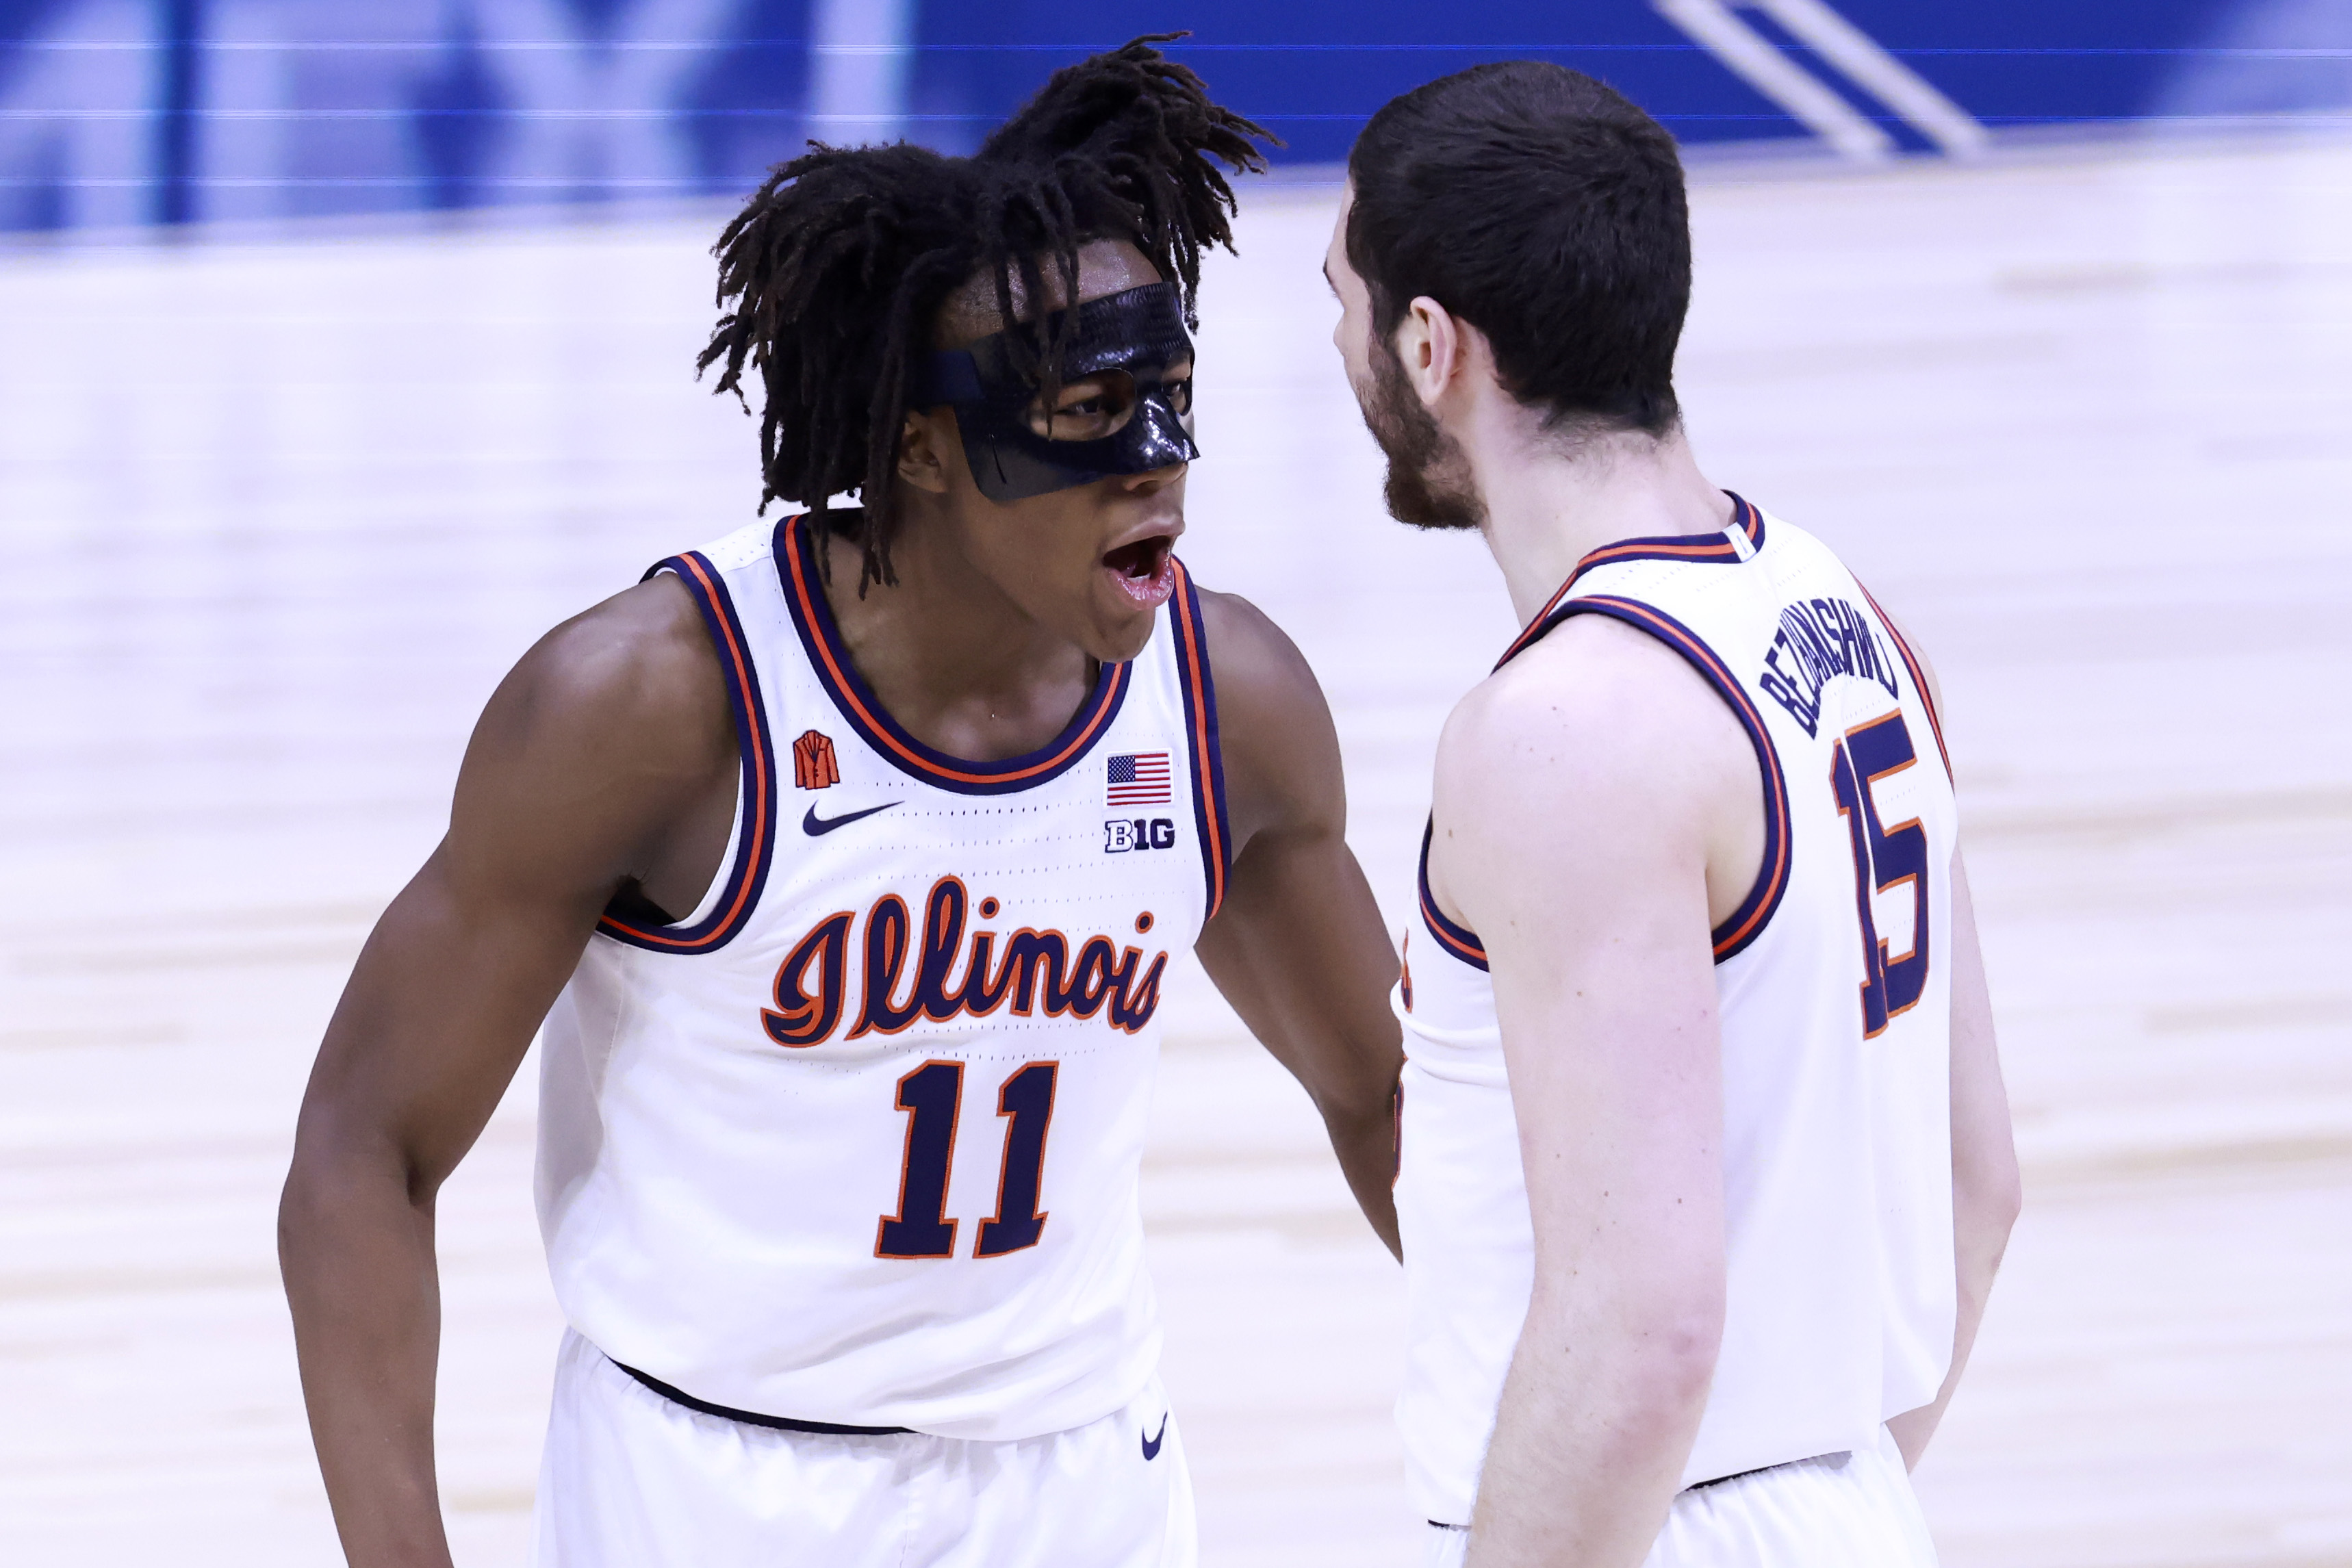 Big Ten Men's Basketball Tournament - Ohio State v Illinois